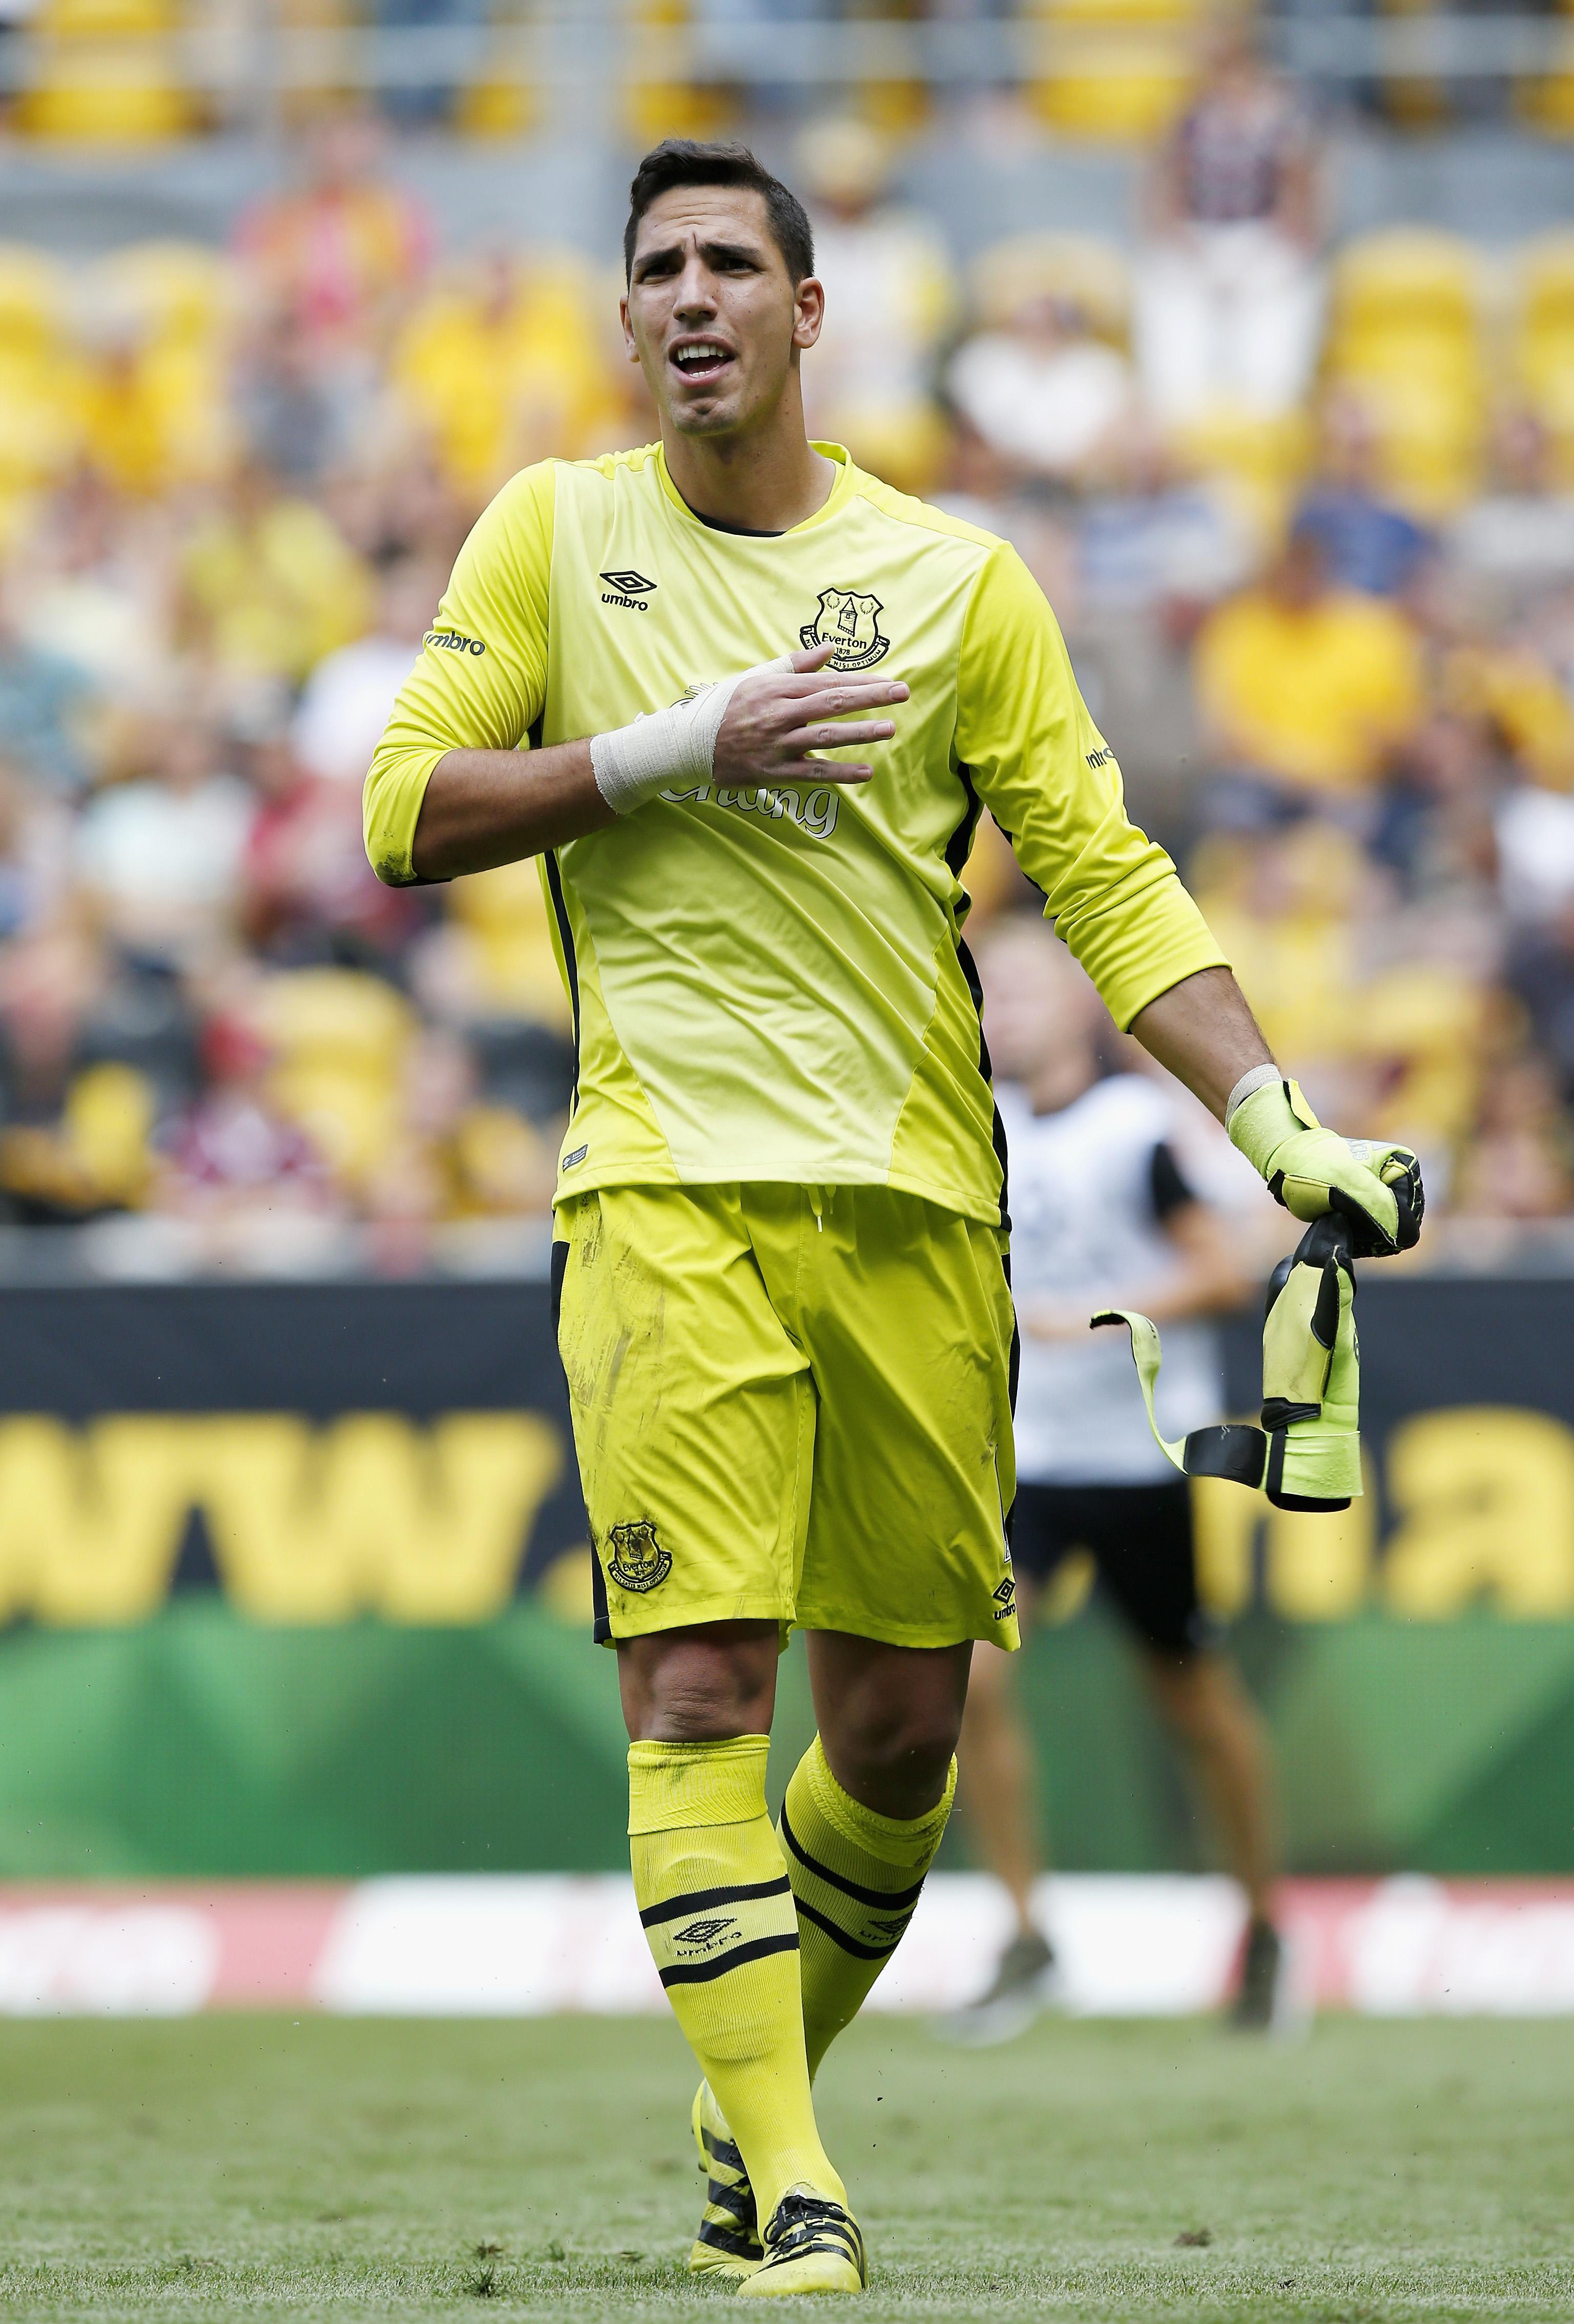 FC Everton v Real Betis - Dynamo Dresden Cup 2016